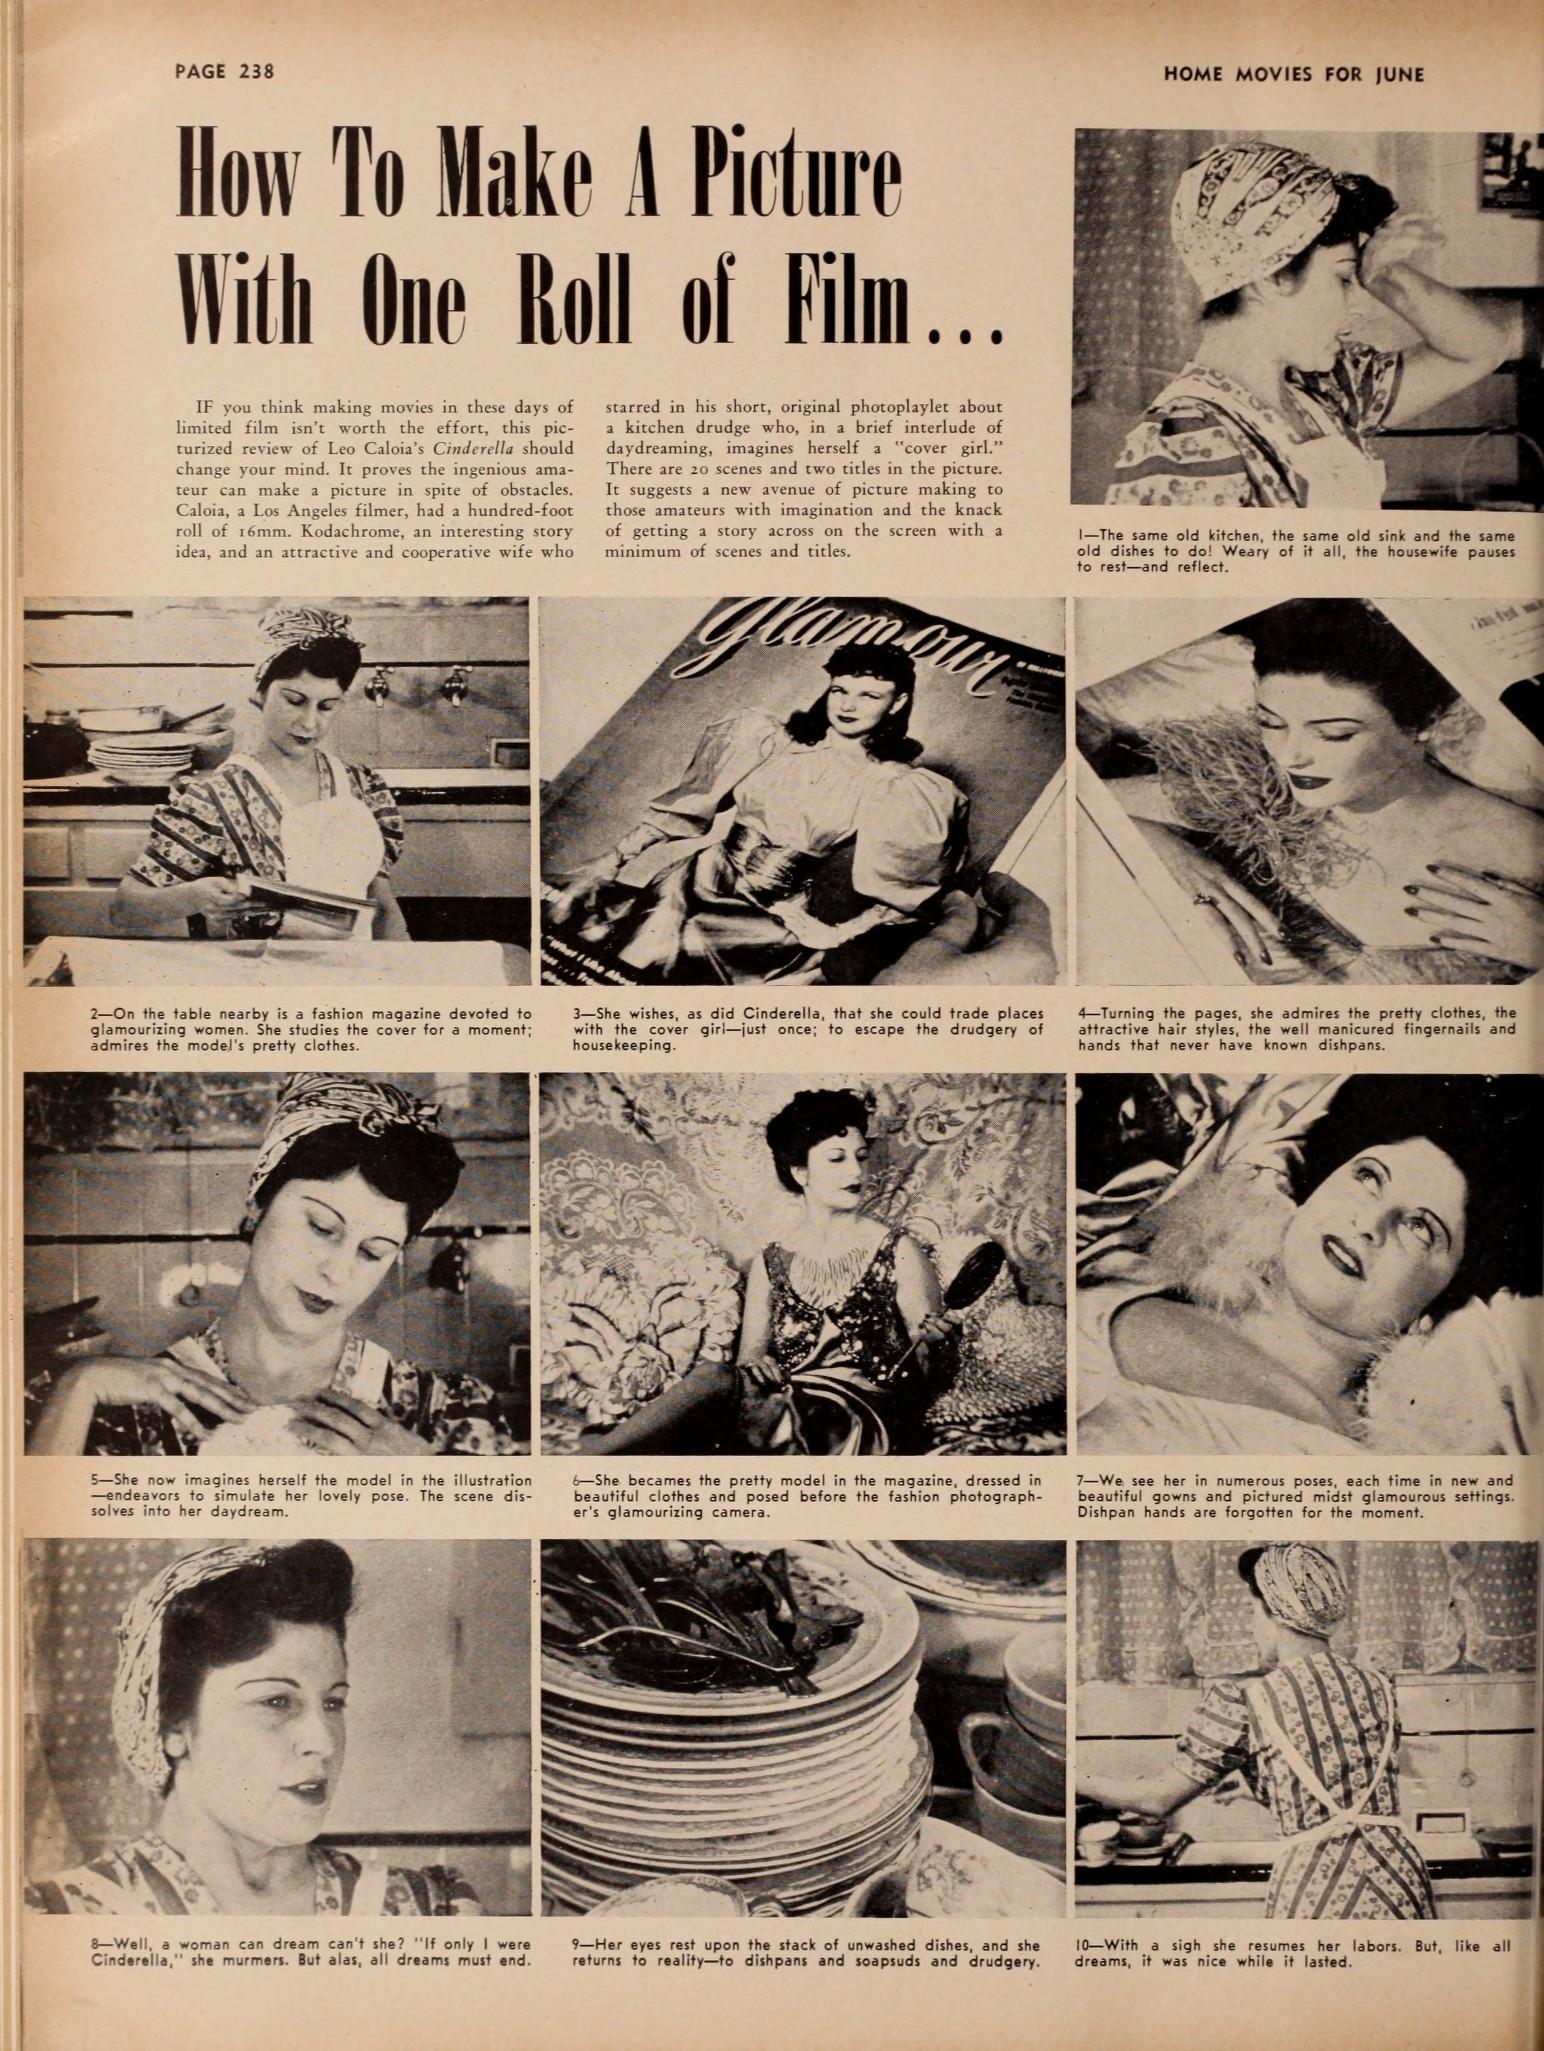 Homemovies194411verh_jp2.zip&file=homemovies194411verh_jp2%2fhomemovies194411verh_0244